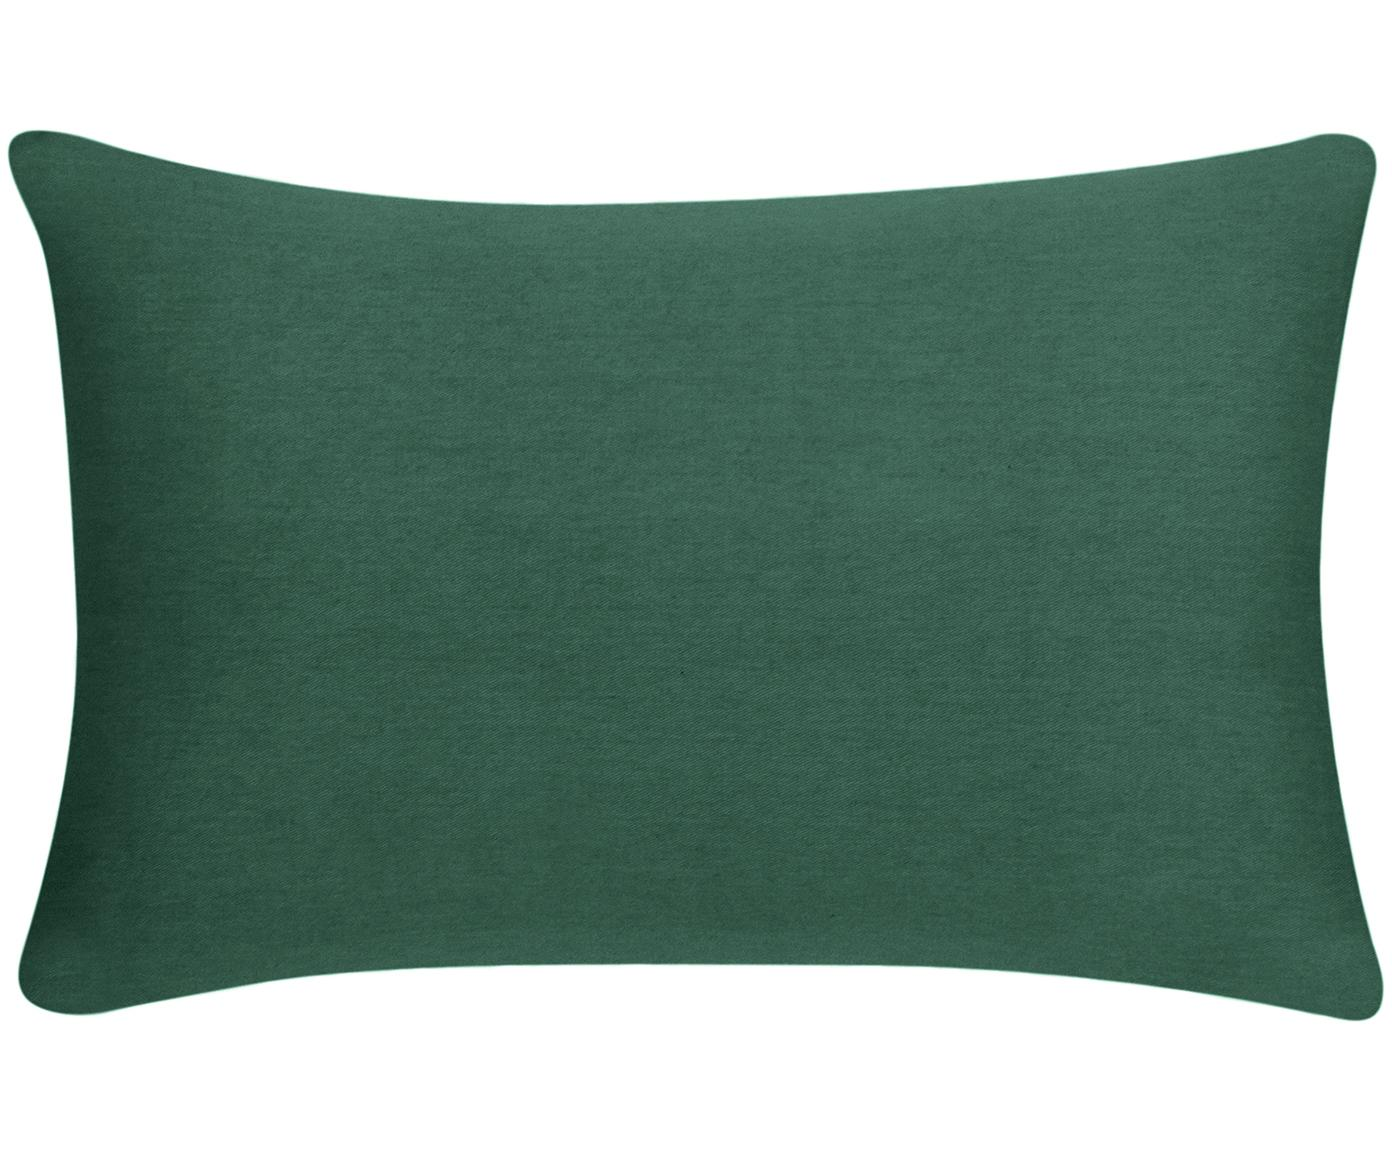 Federa arredo in cotone Mads, Cotone, Verde, Larg. 30 x Lung. 50 cm